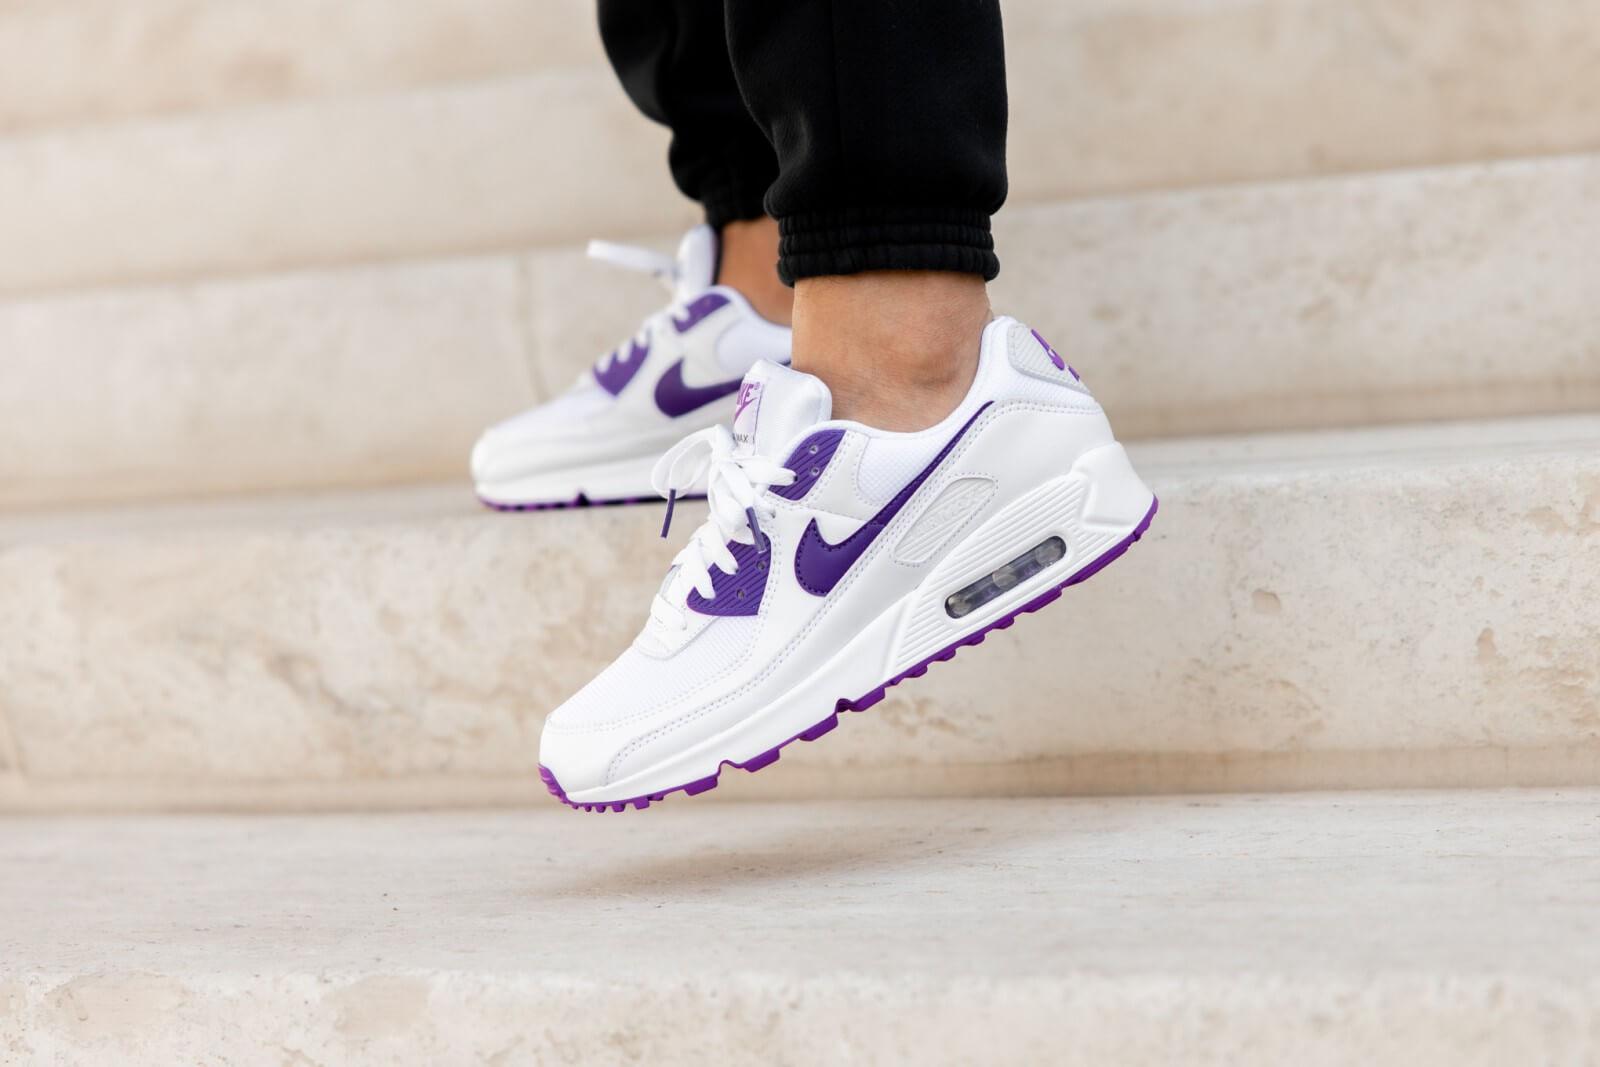 Nike Air Max 90 White/Voltage Purple-Black